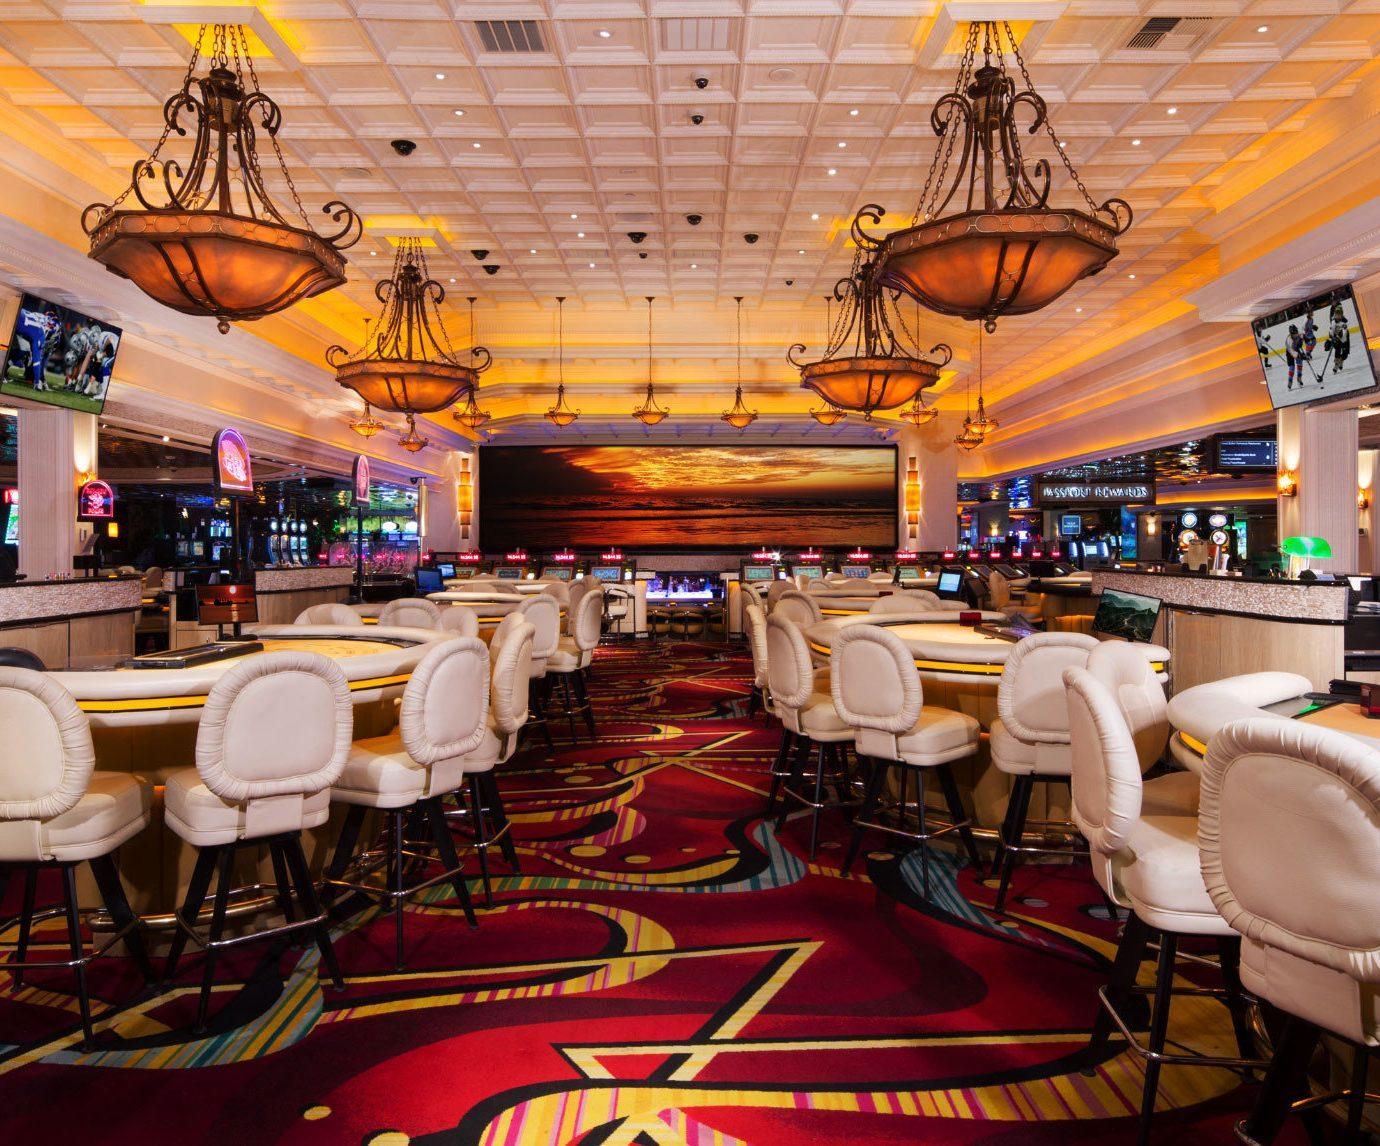 function hall restaurant Casino food court Bar